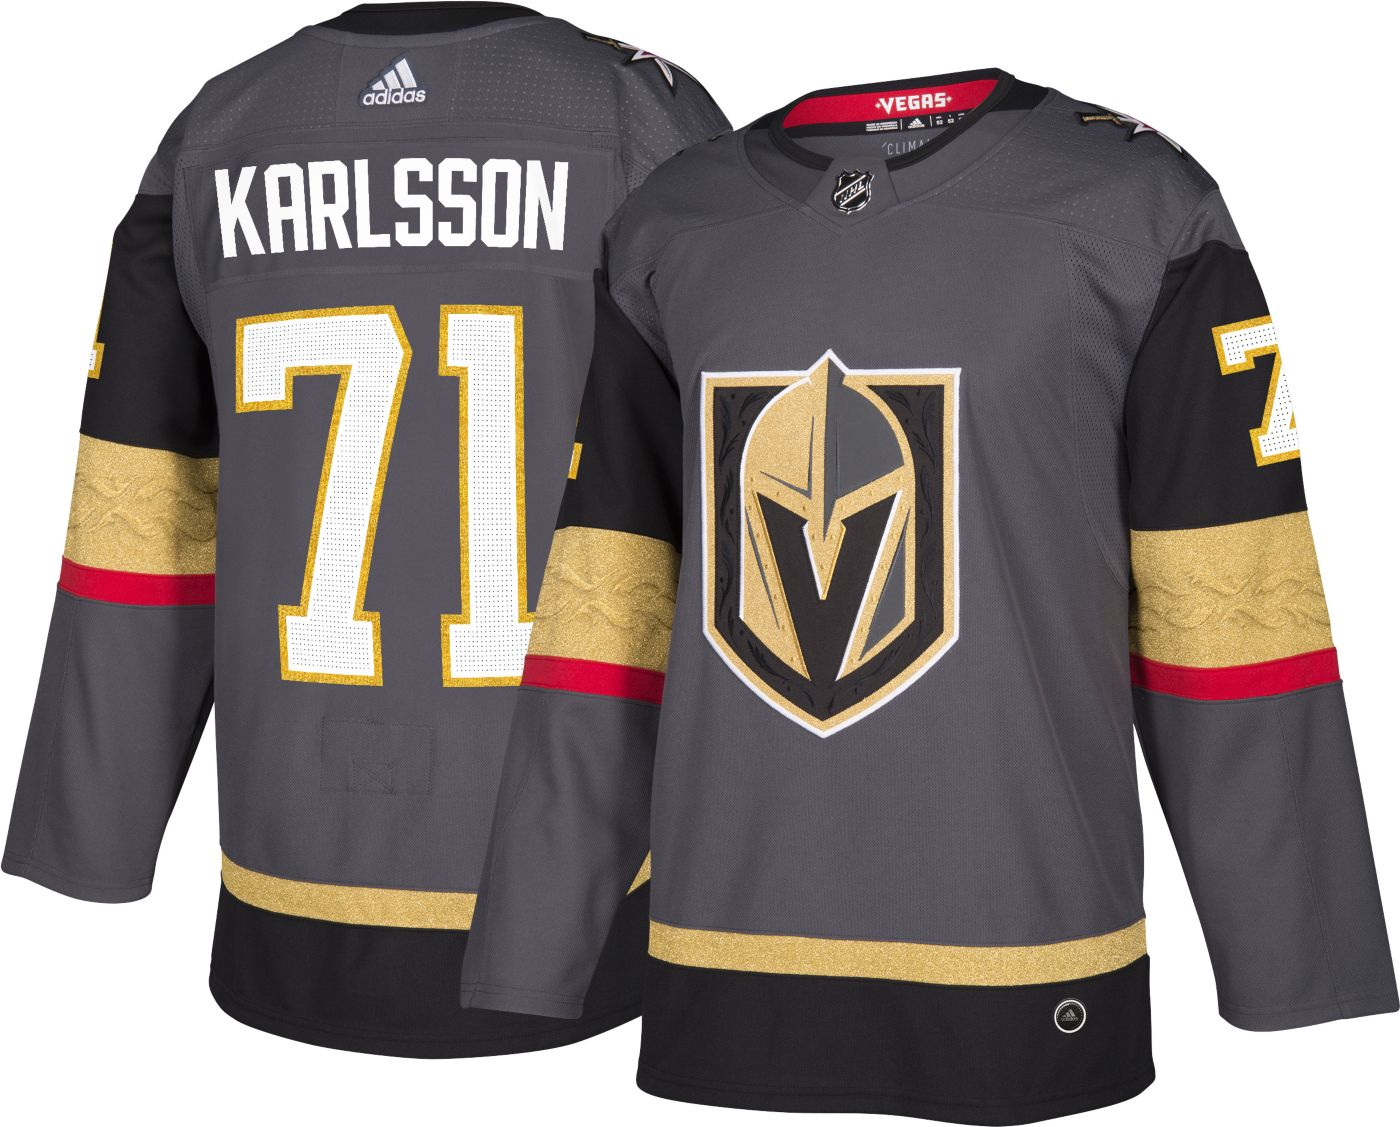 adidas Men's Vegas Golden Knights William Karlsson #71 Authentic Pro Home Jersey